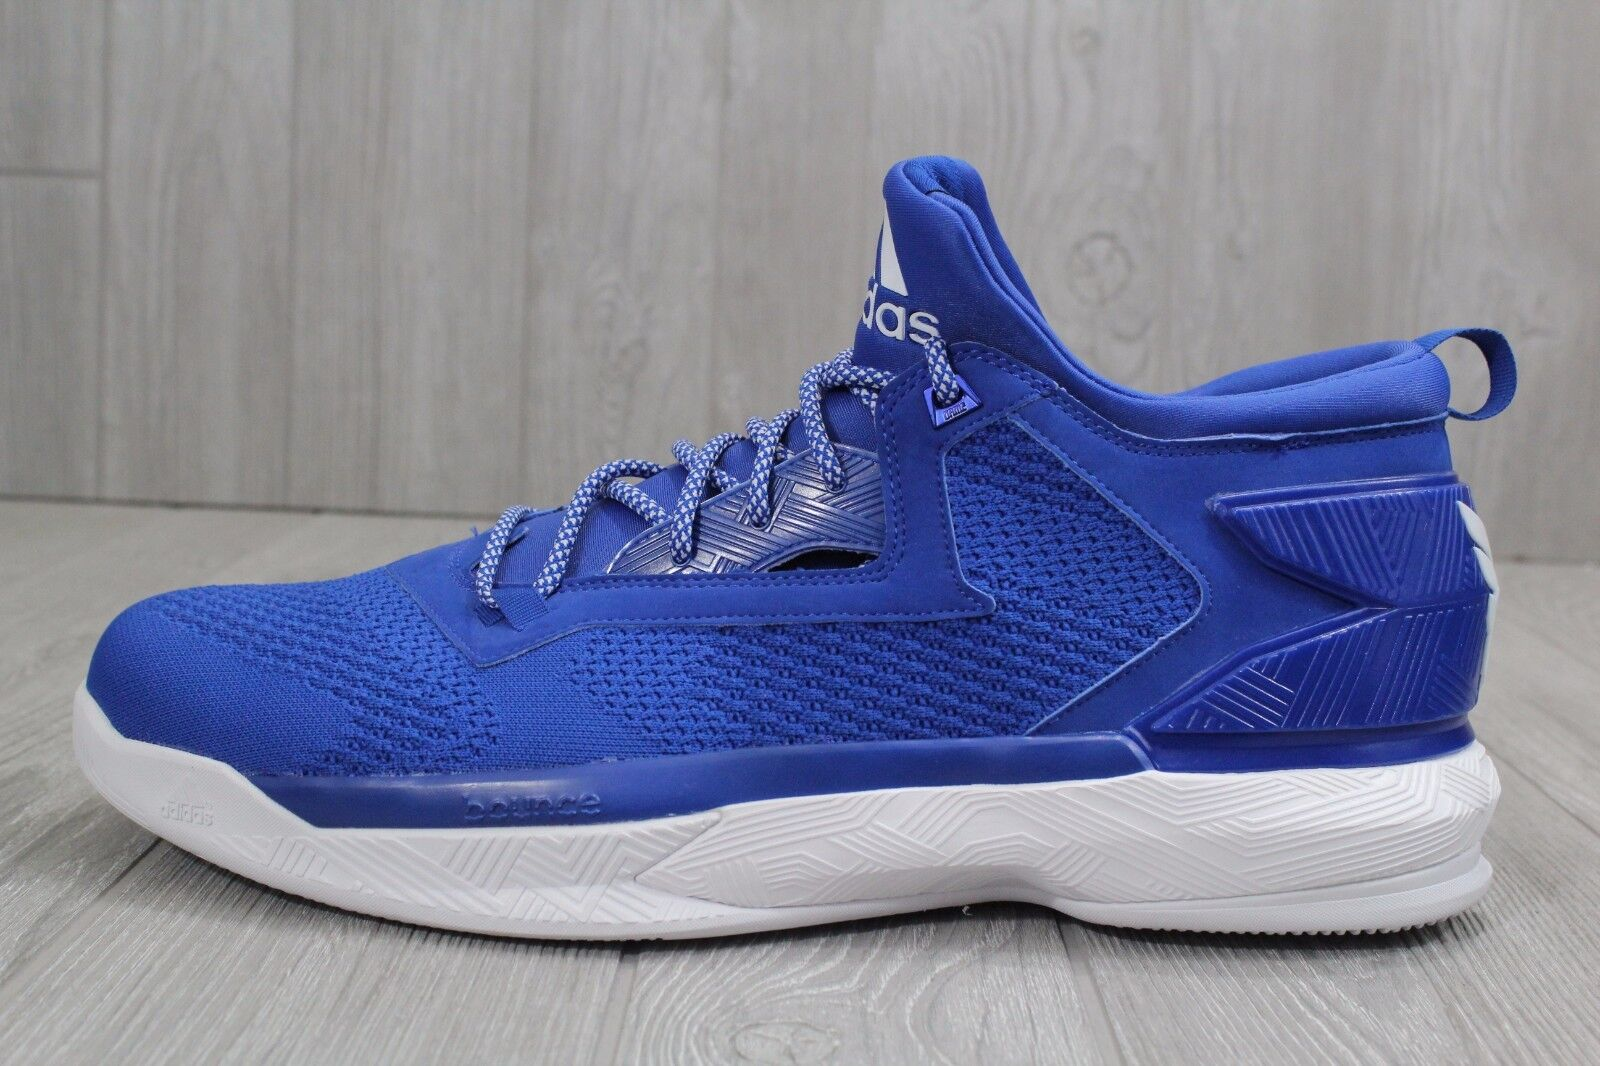 24 New Adidas Men's SM D LILLARD 2.0 NBA Basketball Shoes Blue/White B38891 16